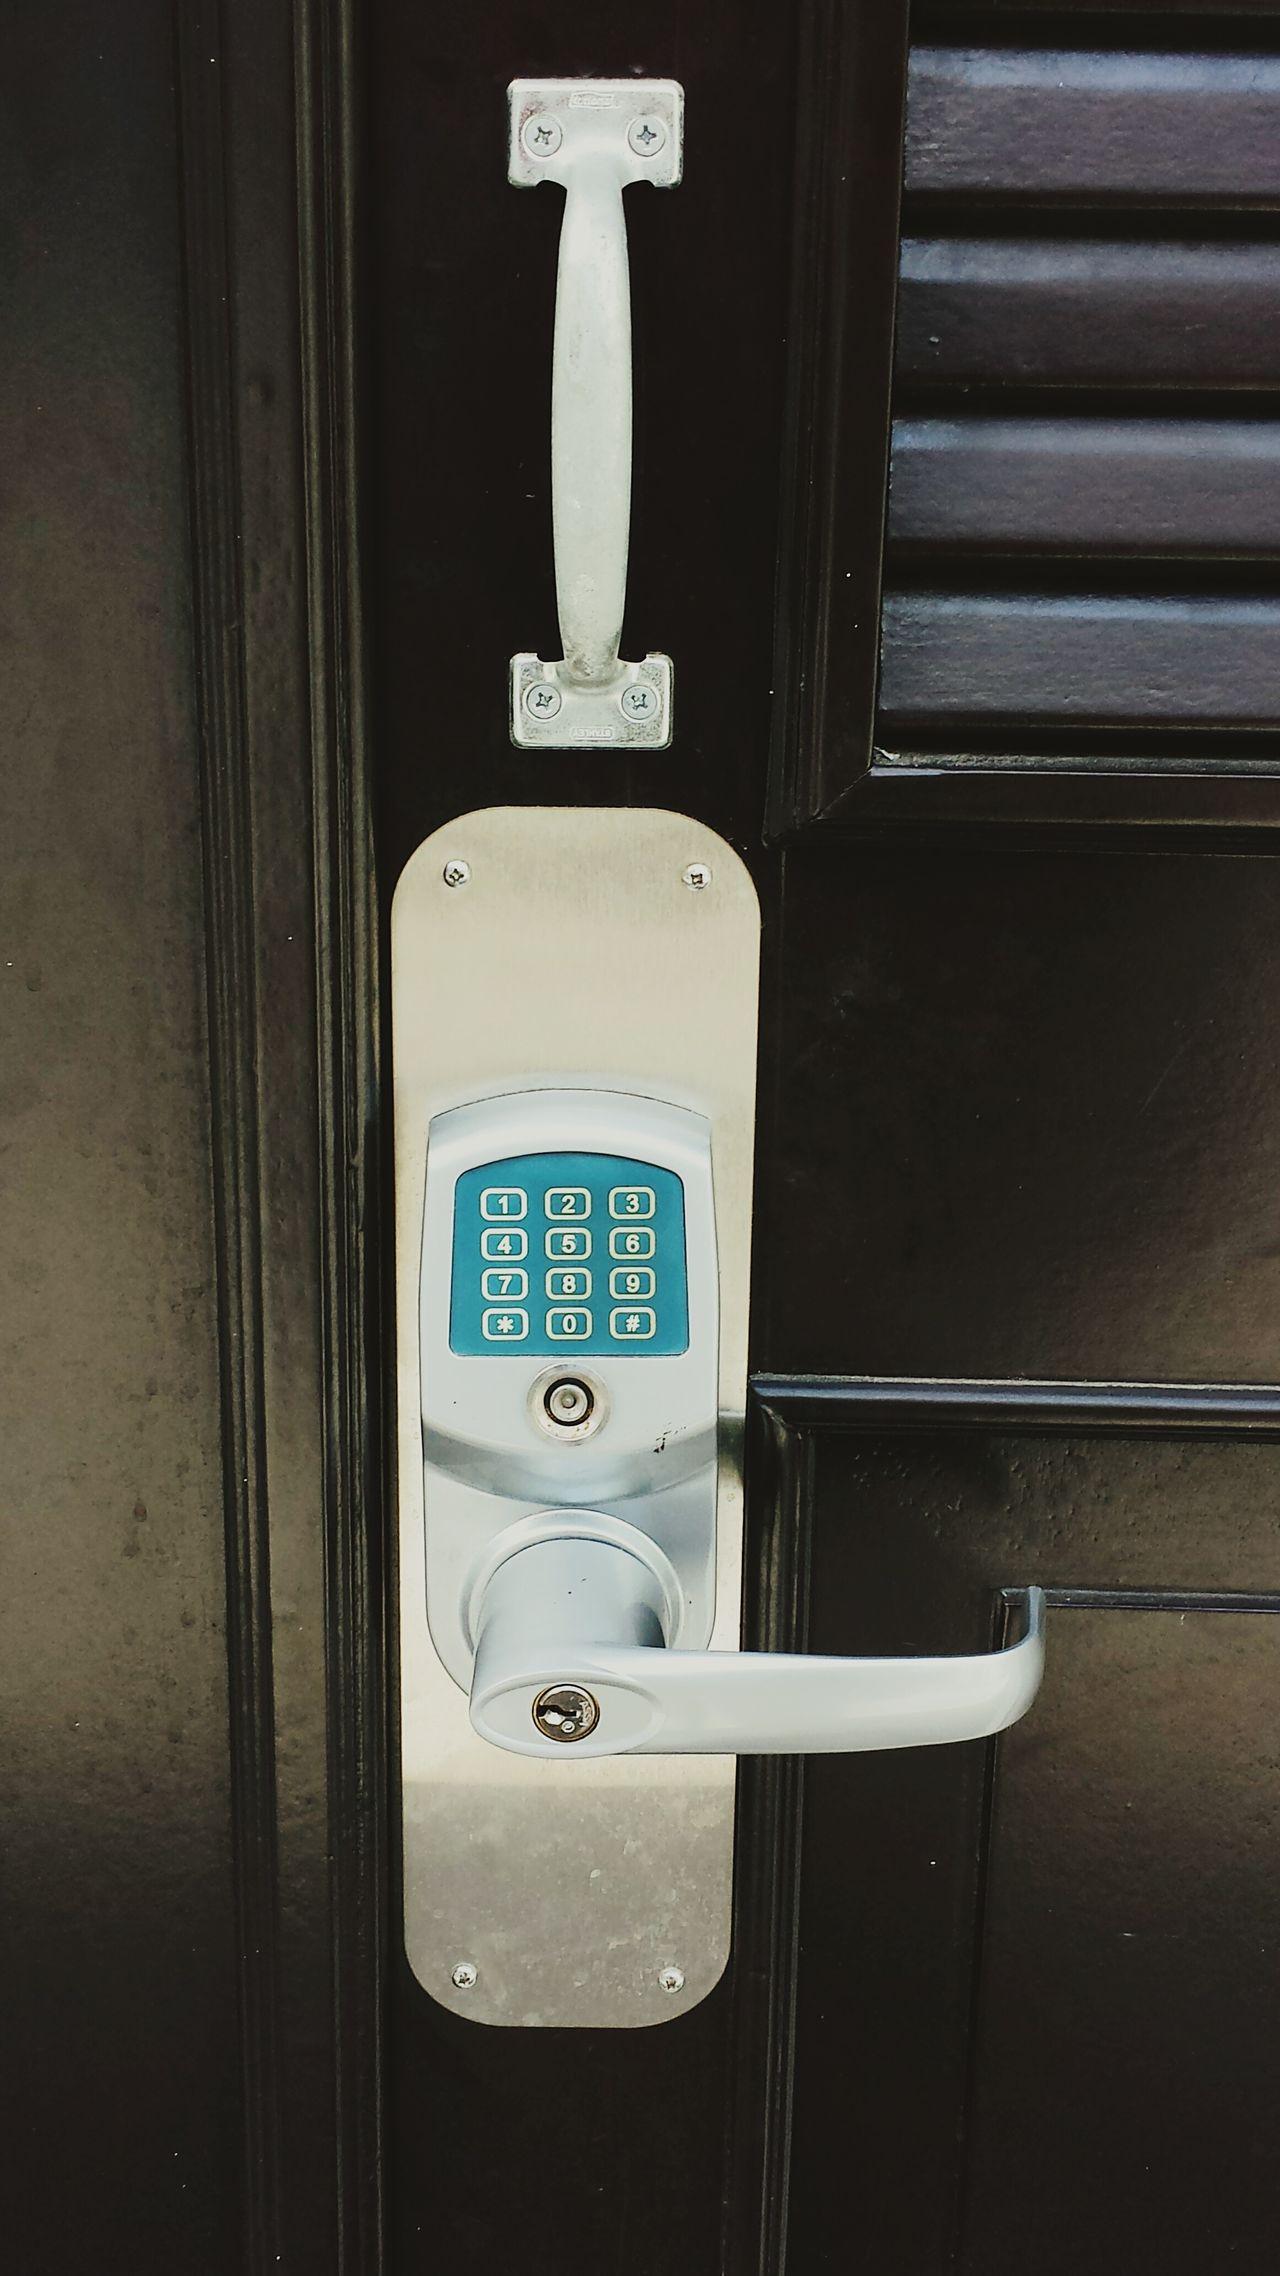 Urban Lifestyle Streetphotography Open Edit Human Meets Technology City Life Door Doorknob Lock Doorporn Modern Lock Close Up Technology